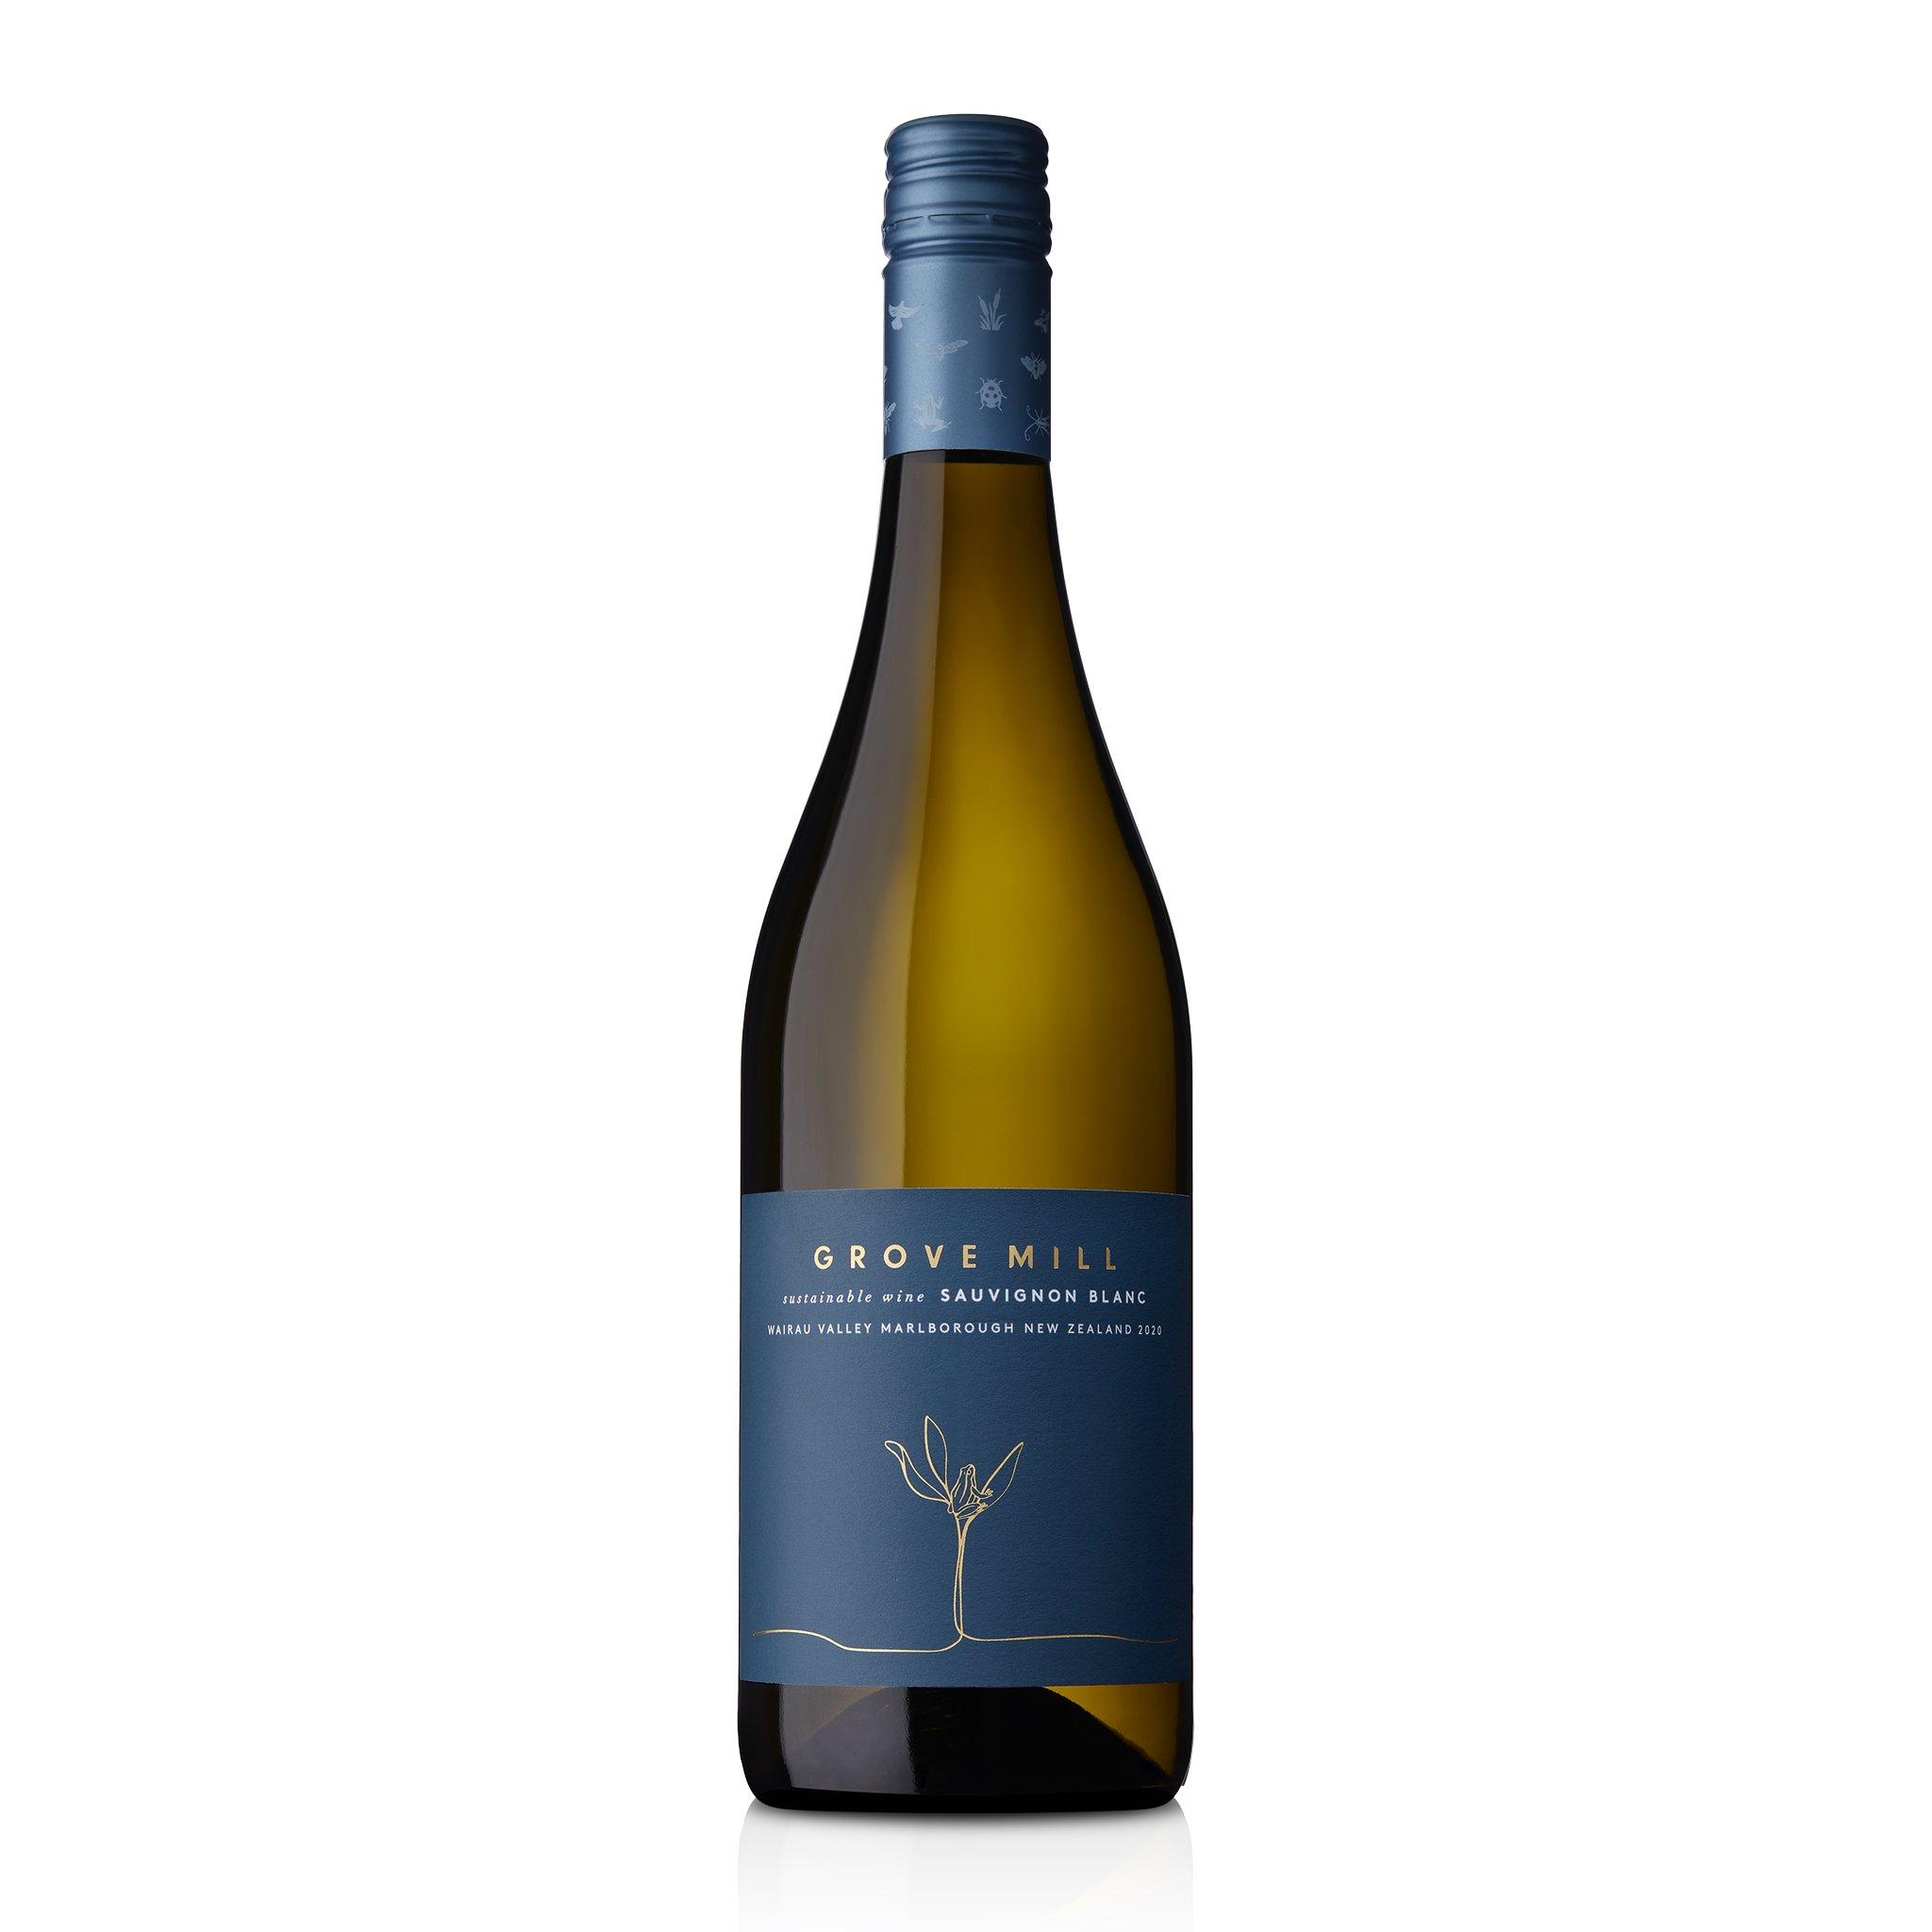 Grove Mill Sauvignon Blanc 2020 12 Bottles